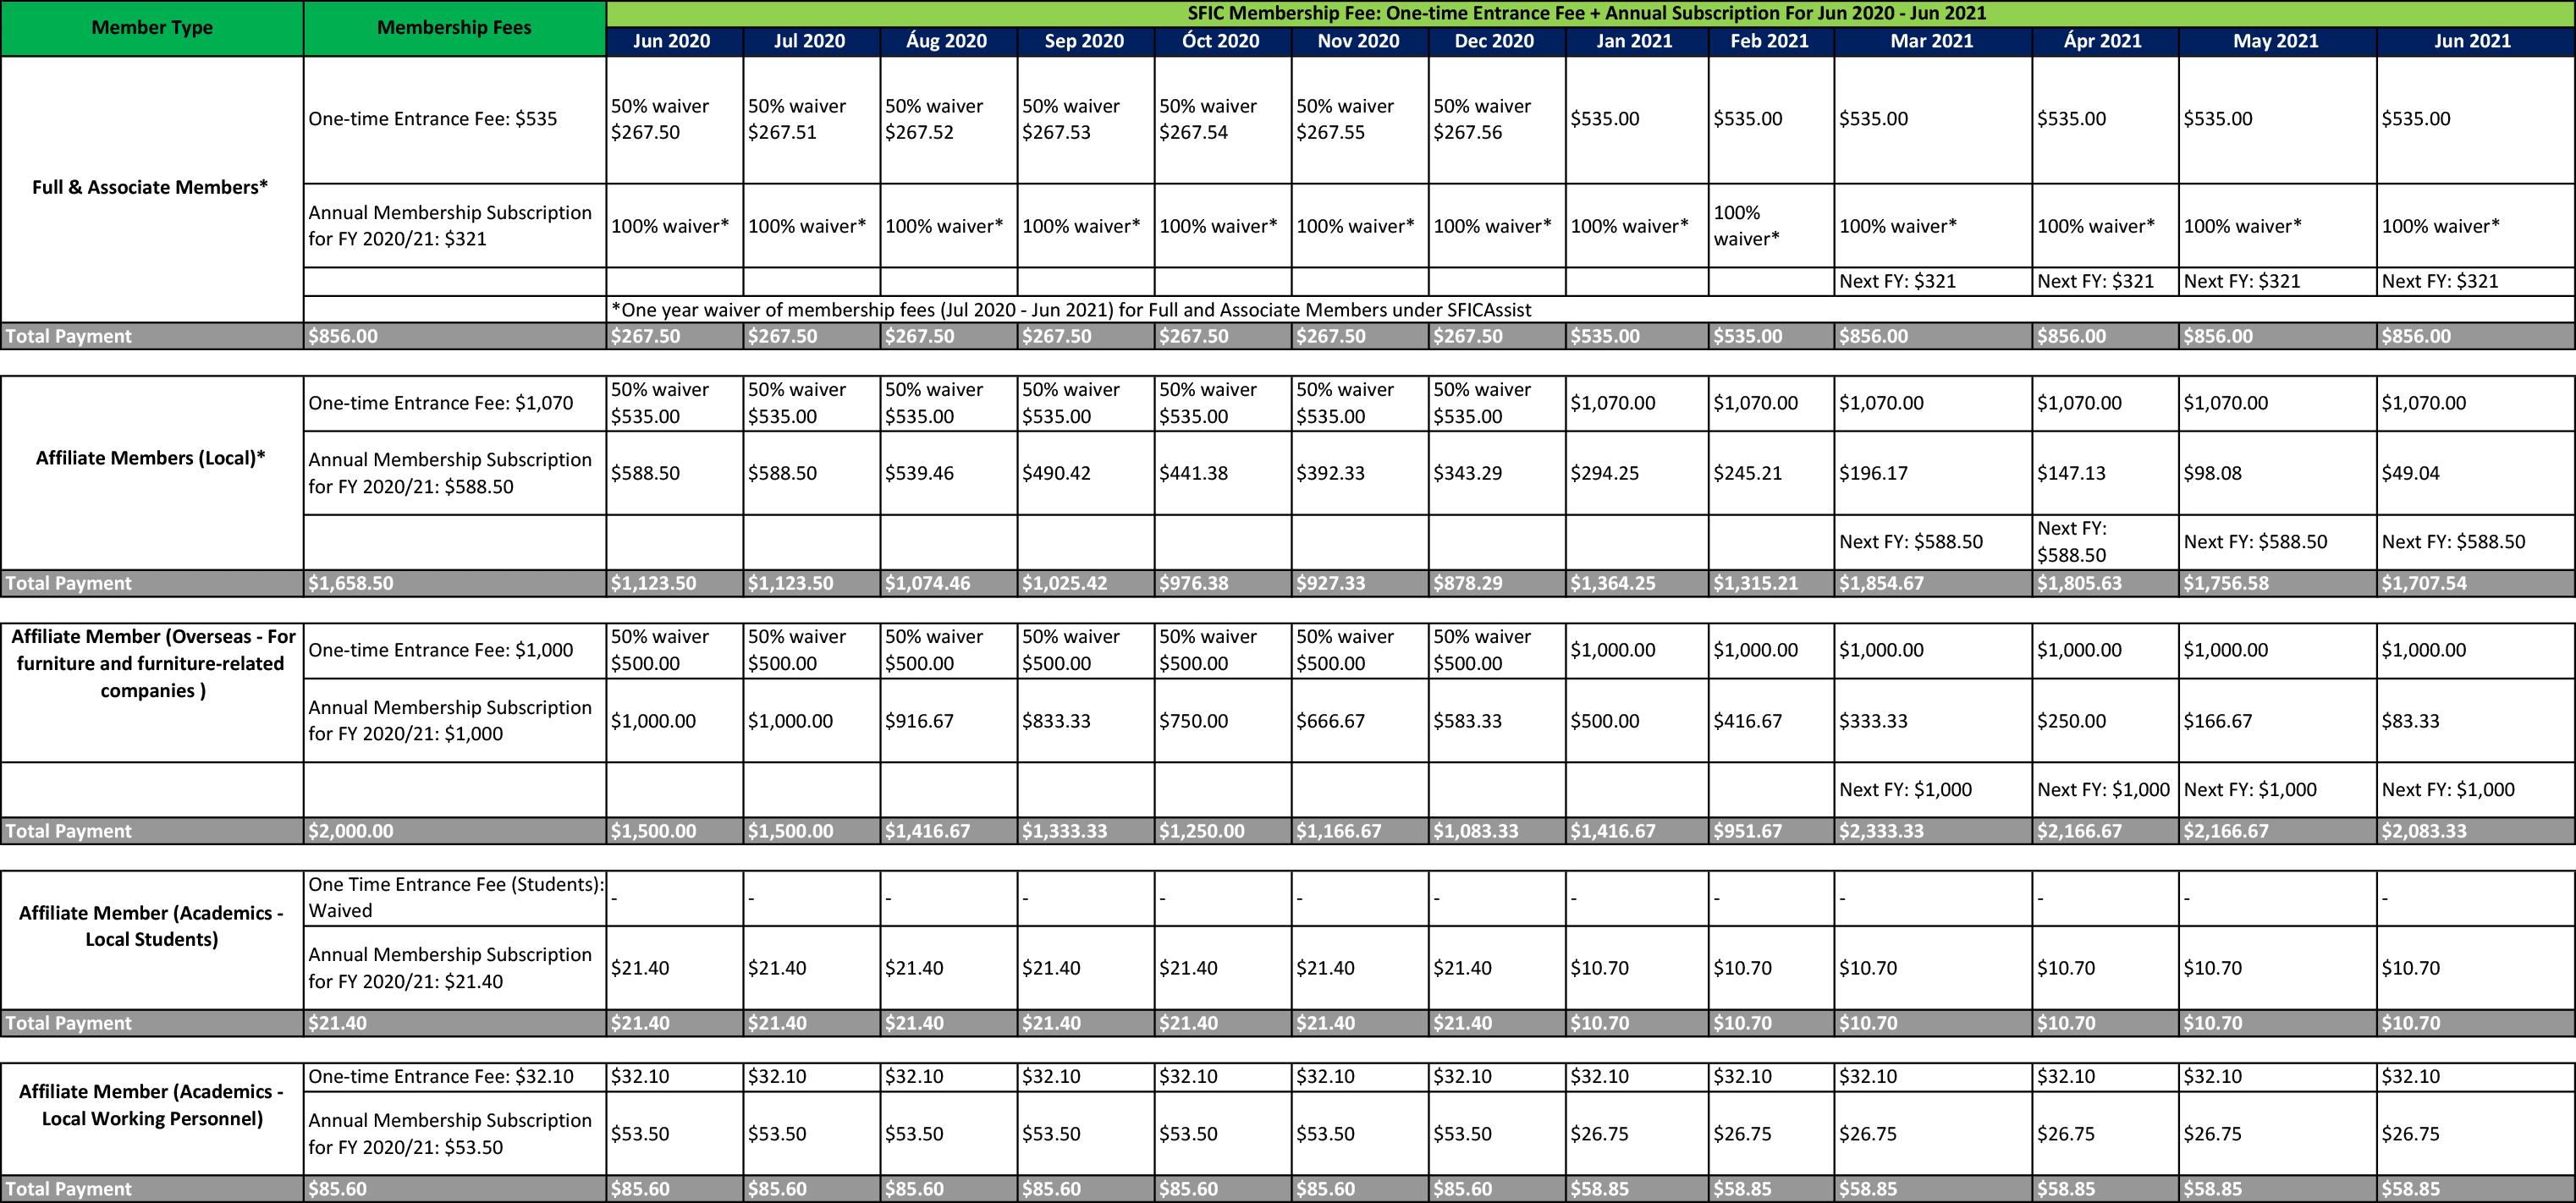 Membership fees table